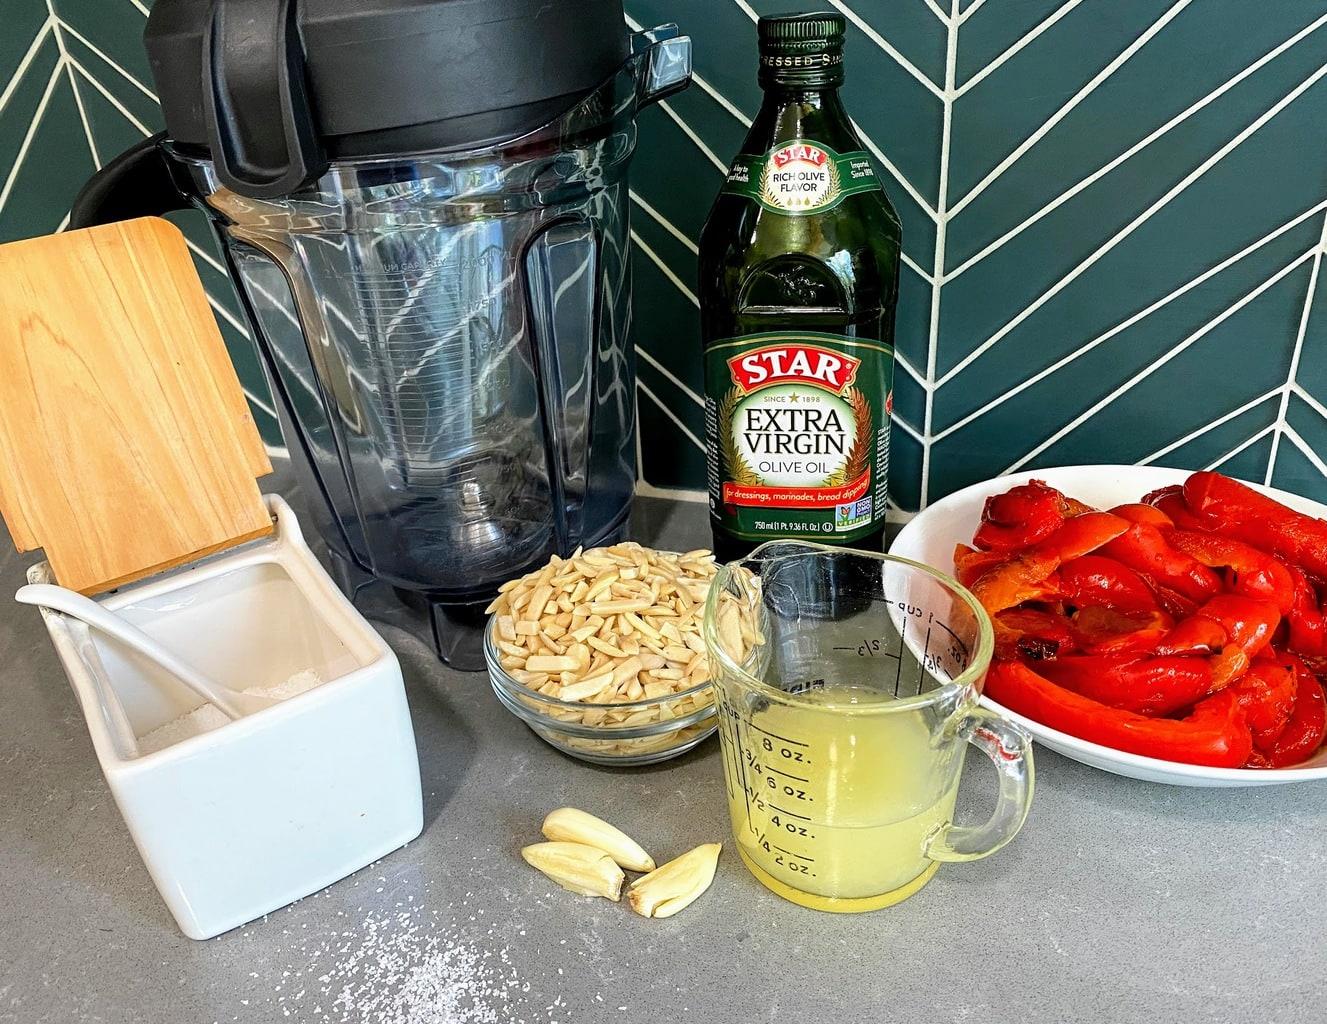 romesco sauce ingredients on counter: roasted peppers, lemon juice, garlic cloves, almonds, olive oil, salt and blender